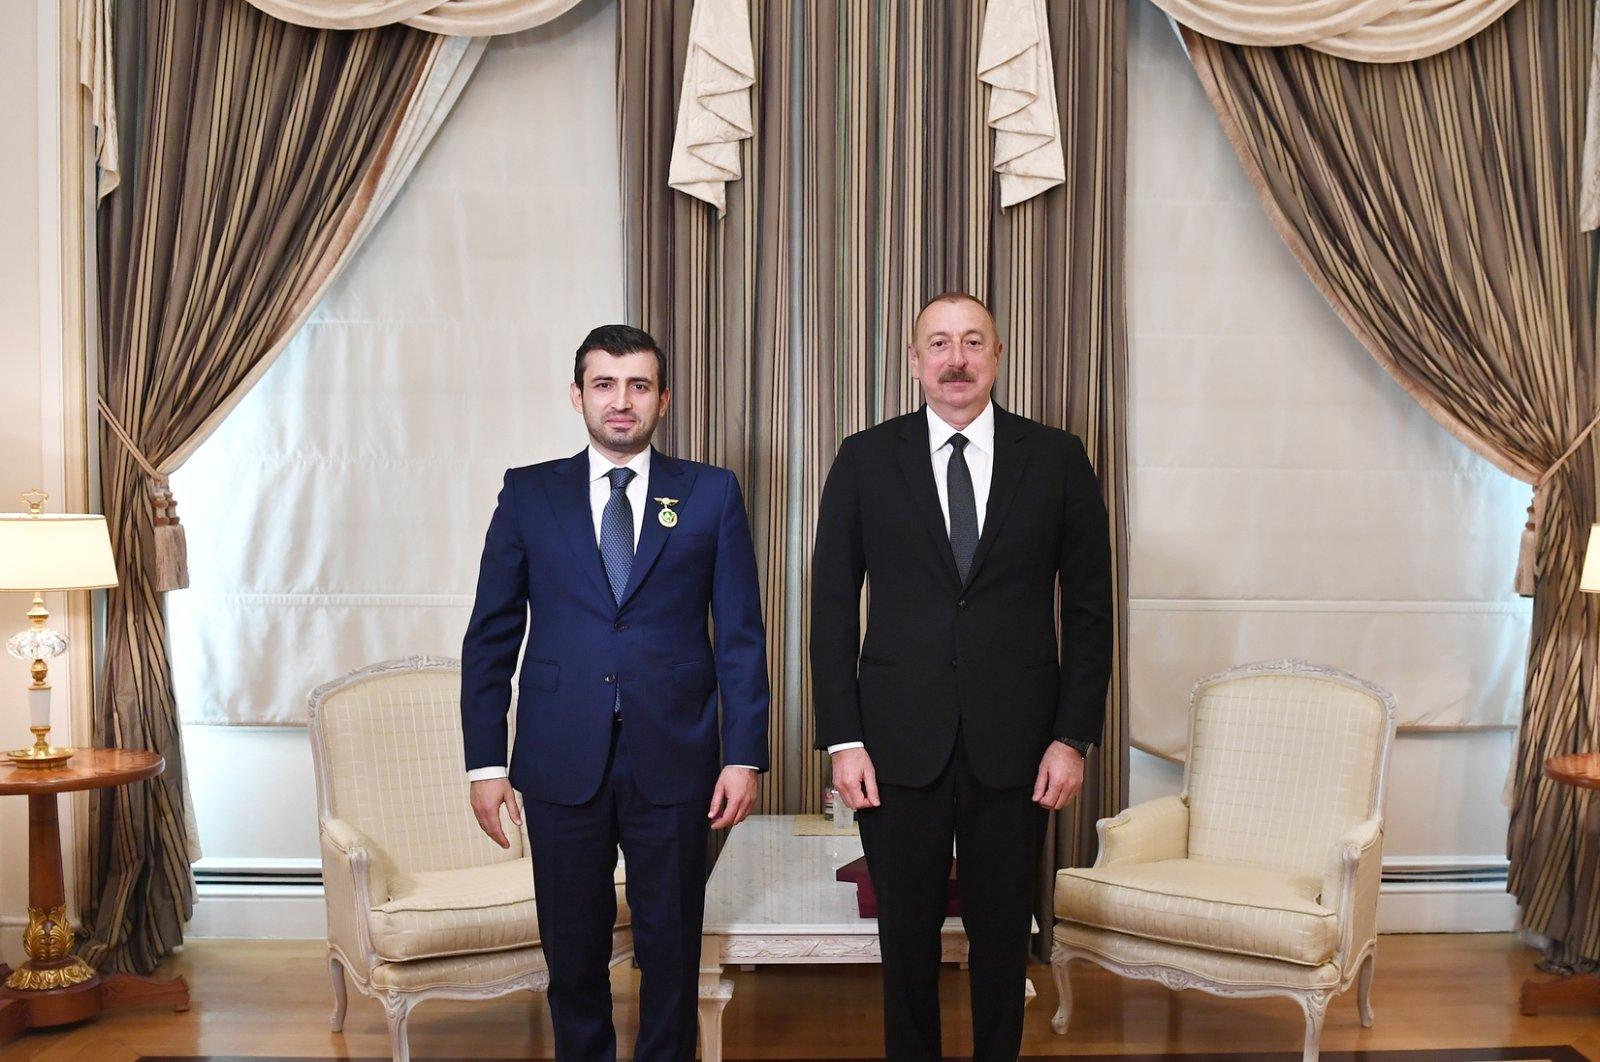 Baykar's CTO Selçuk Bayraktar (L), Azerbaijan's President Ilham Aliyev, Baku, Azerbaijan, April 1, 2021. (Photo by the Presidency of Azerbaijan via AA)